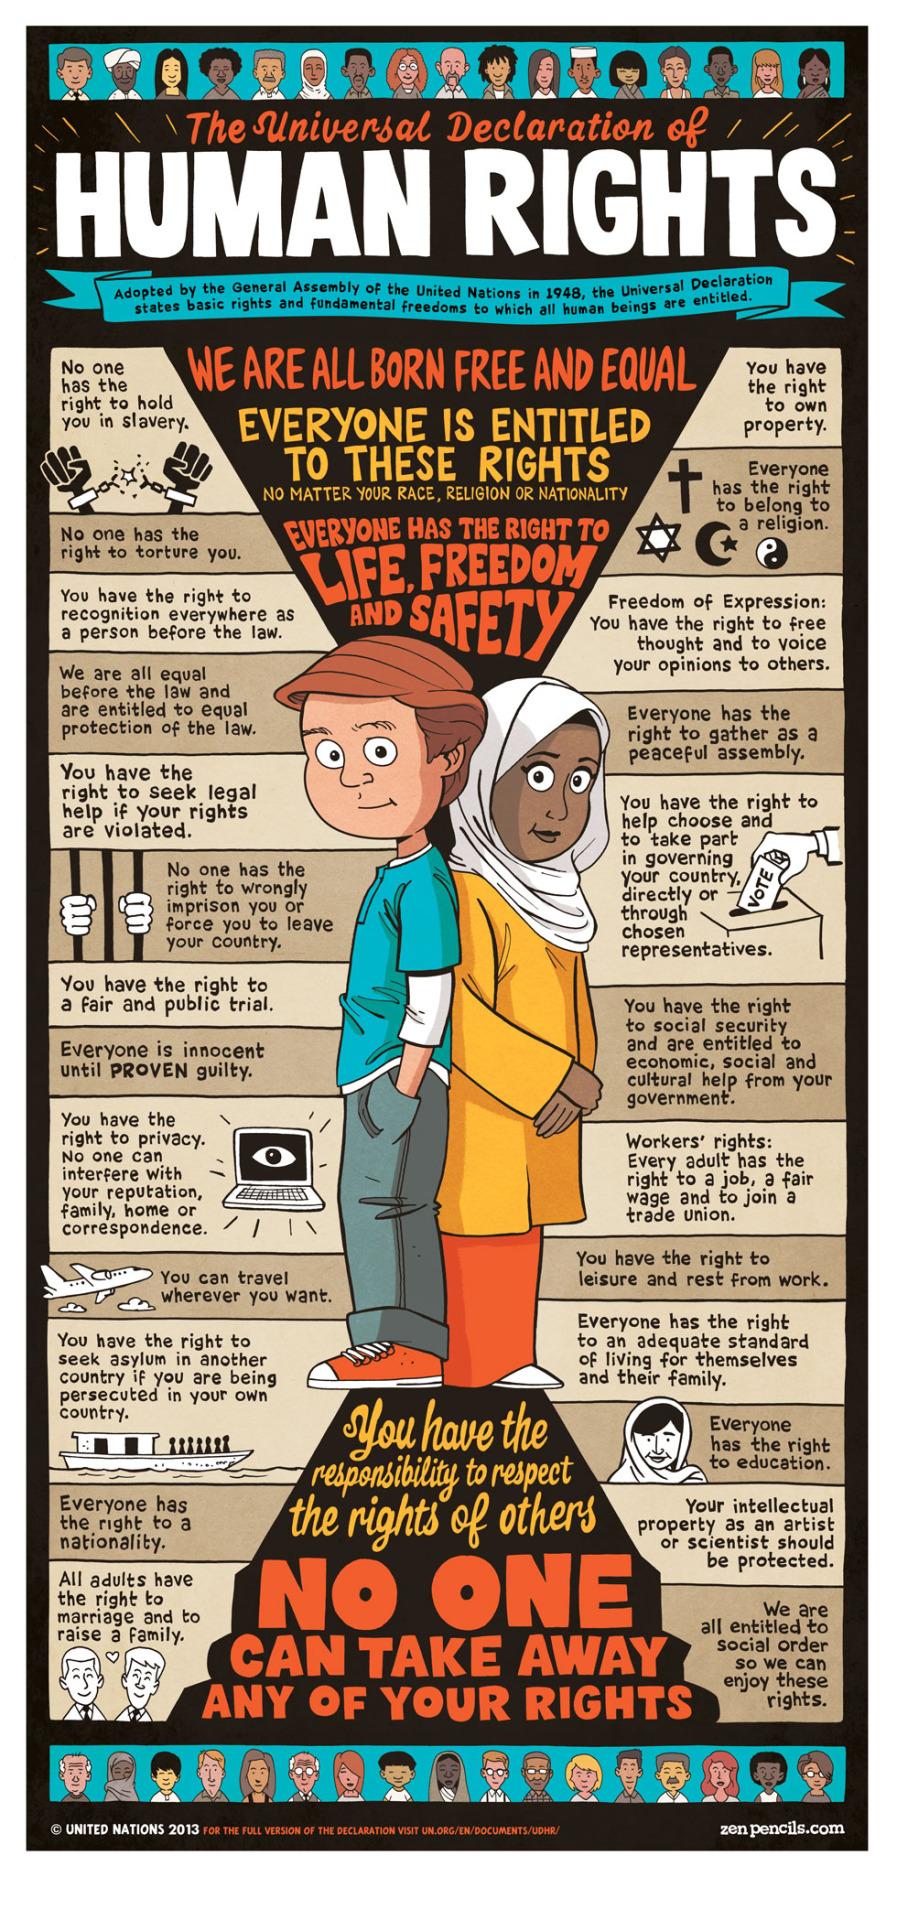 southafrica internationalhumanrightsday humanrights politics racism sexism misogyny feminism grabaflight